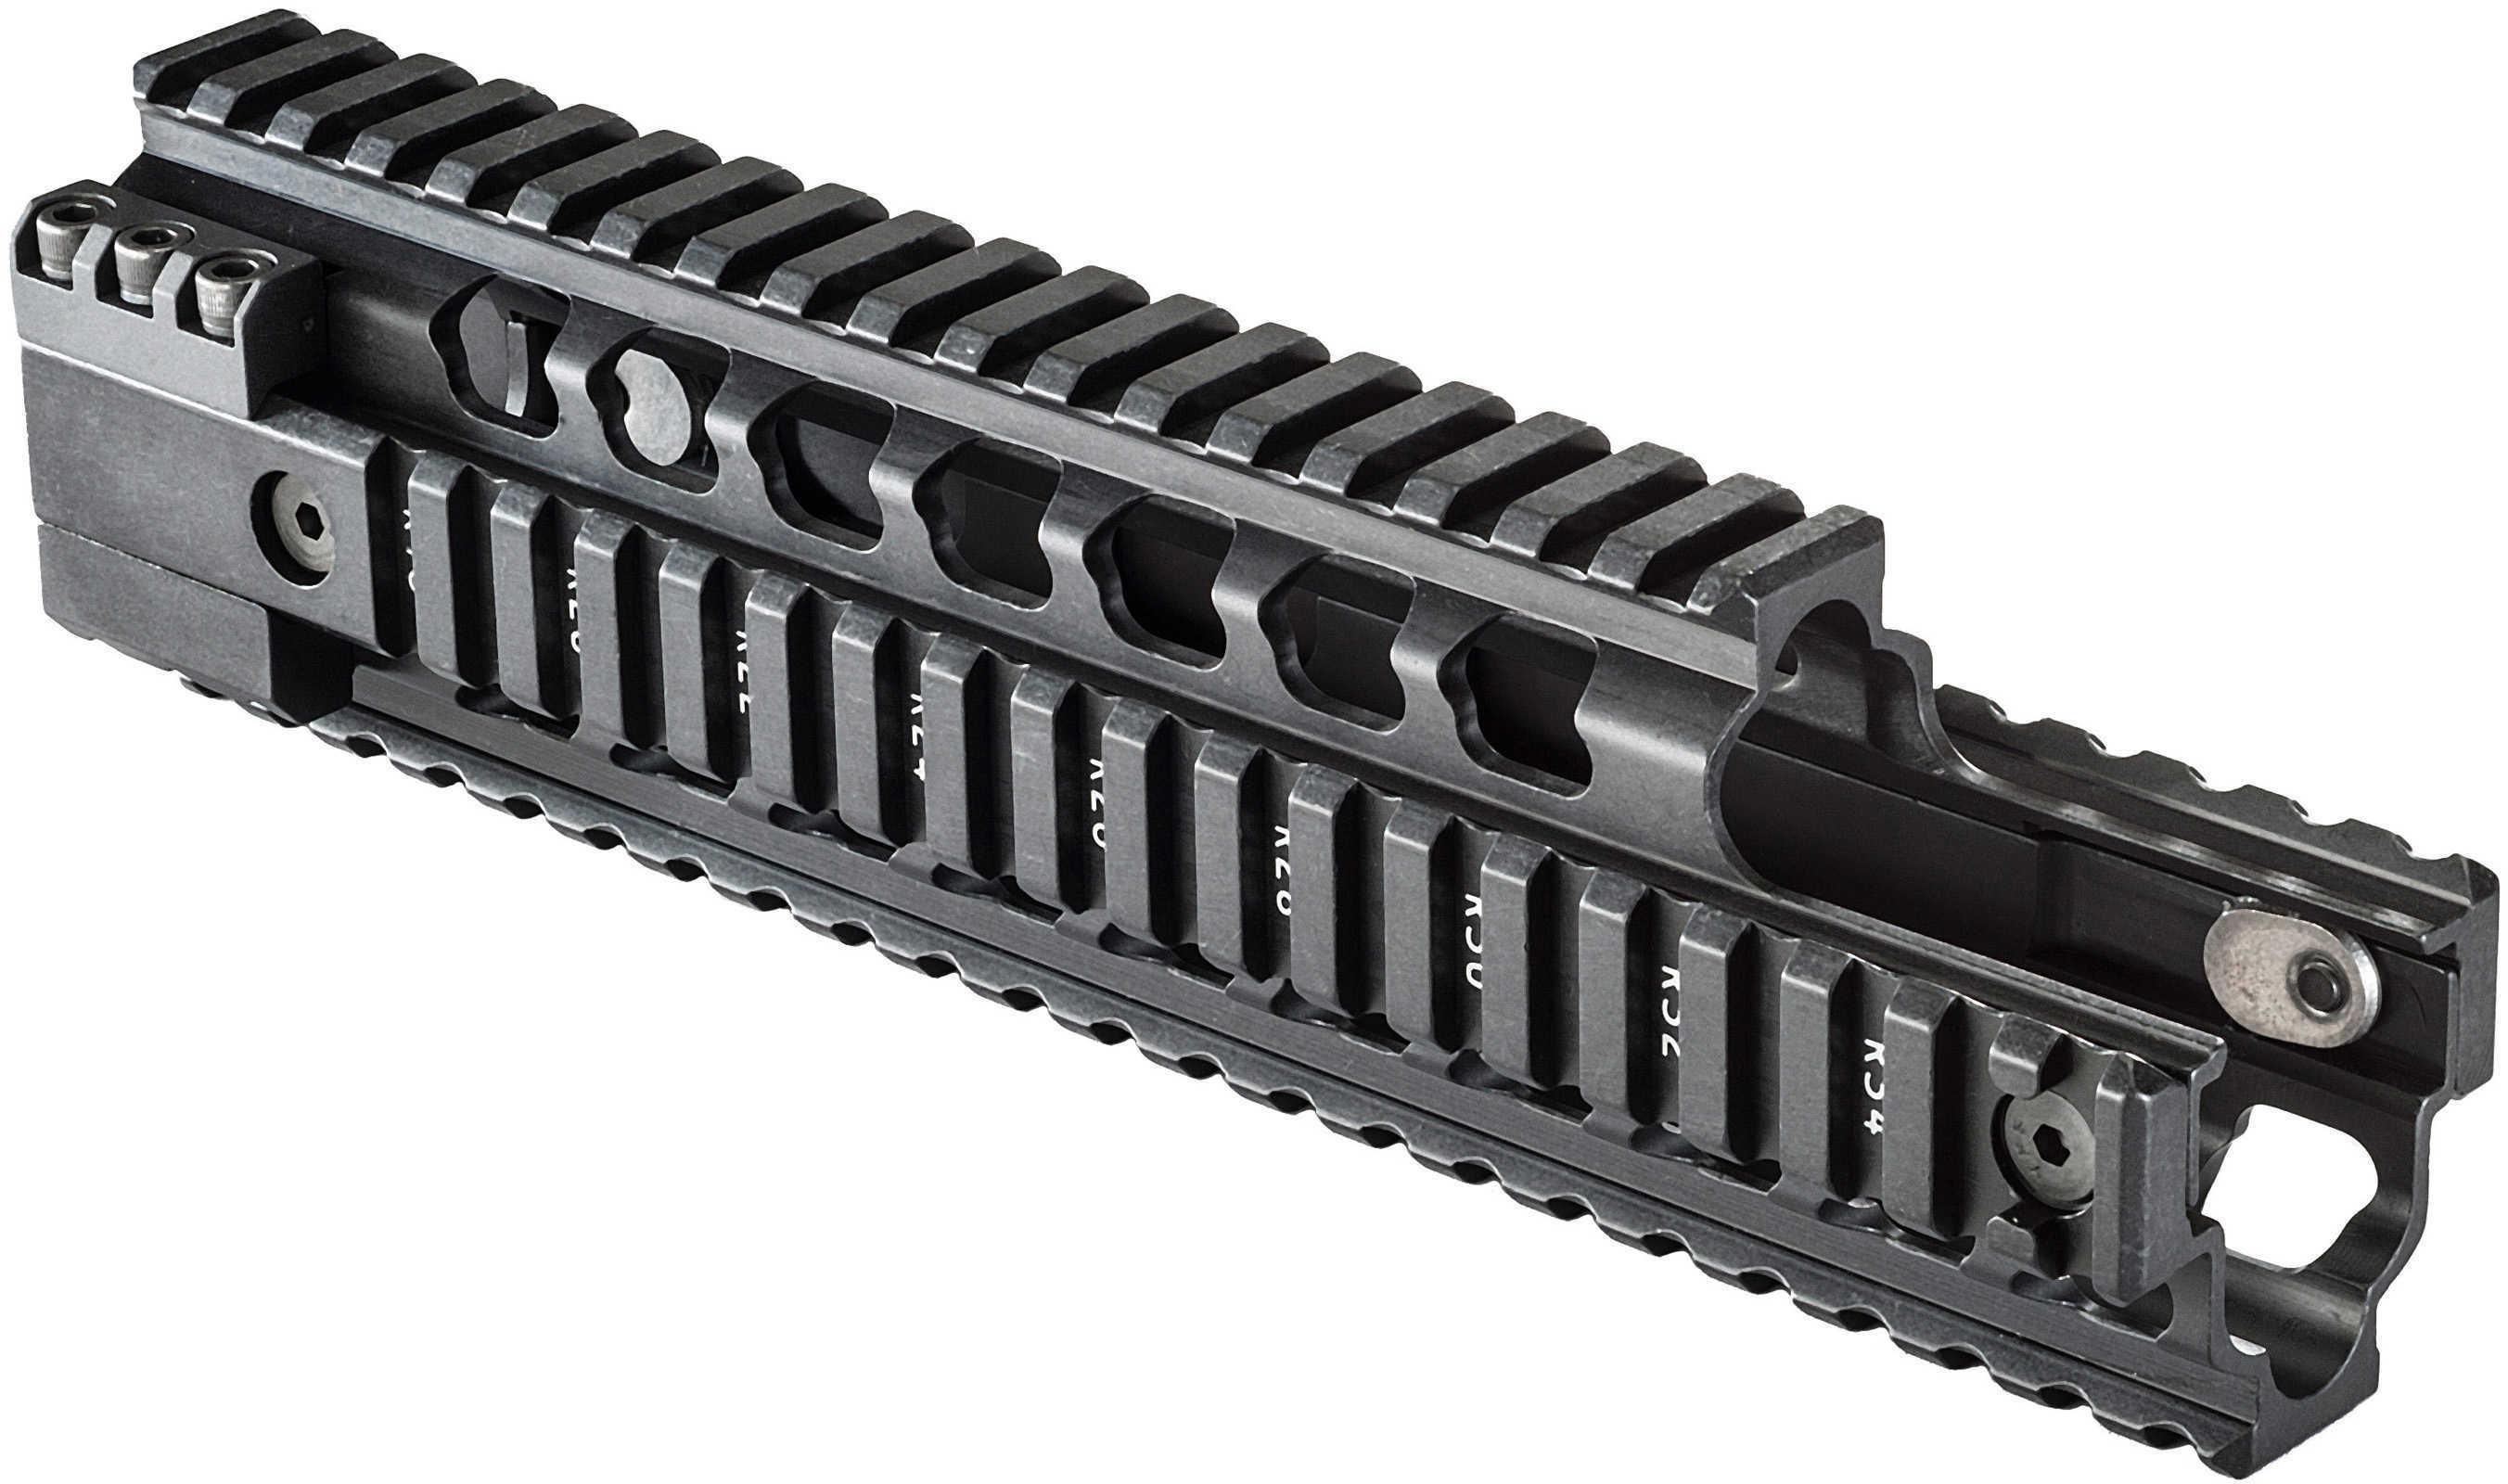 Z-Rail Free Float AR15/M15 Rail System, Overshoot Md: 4813-Os